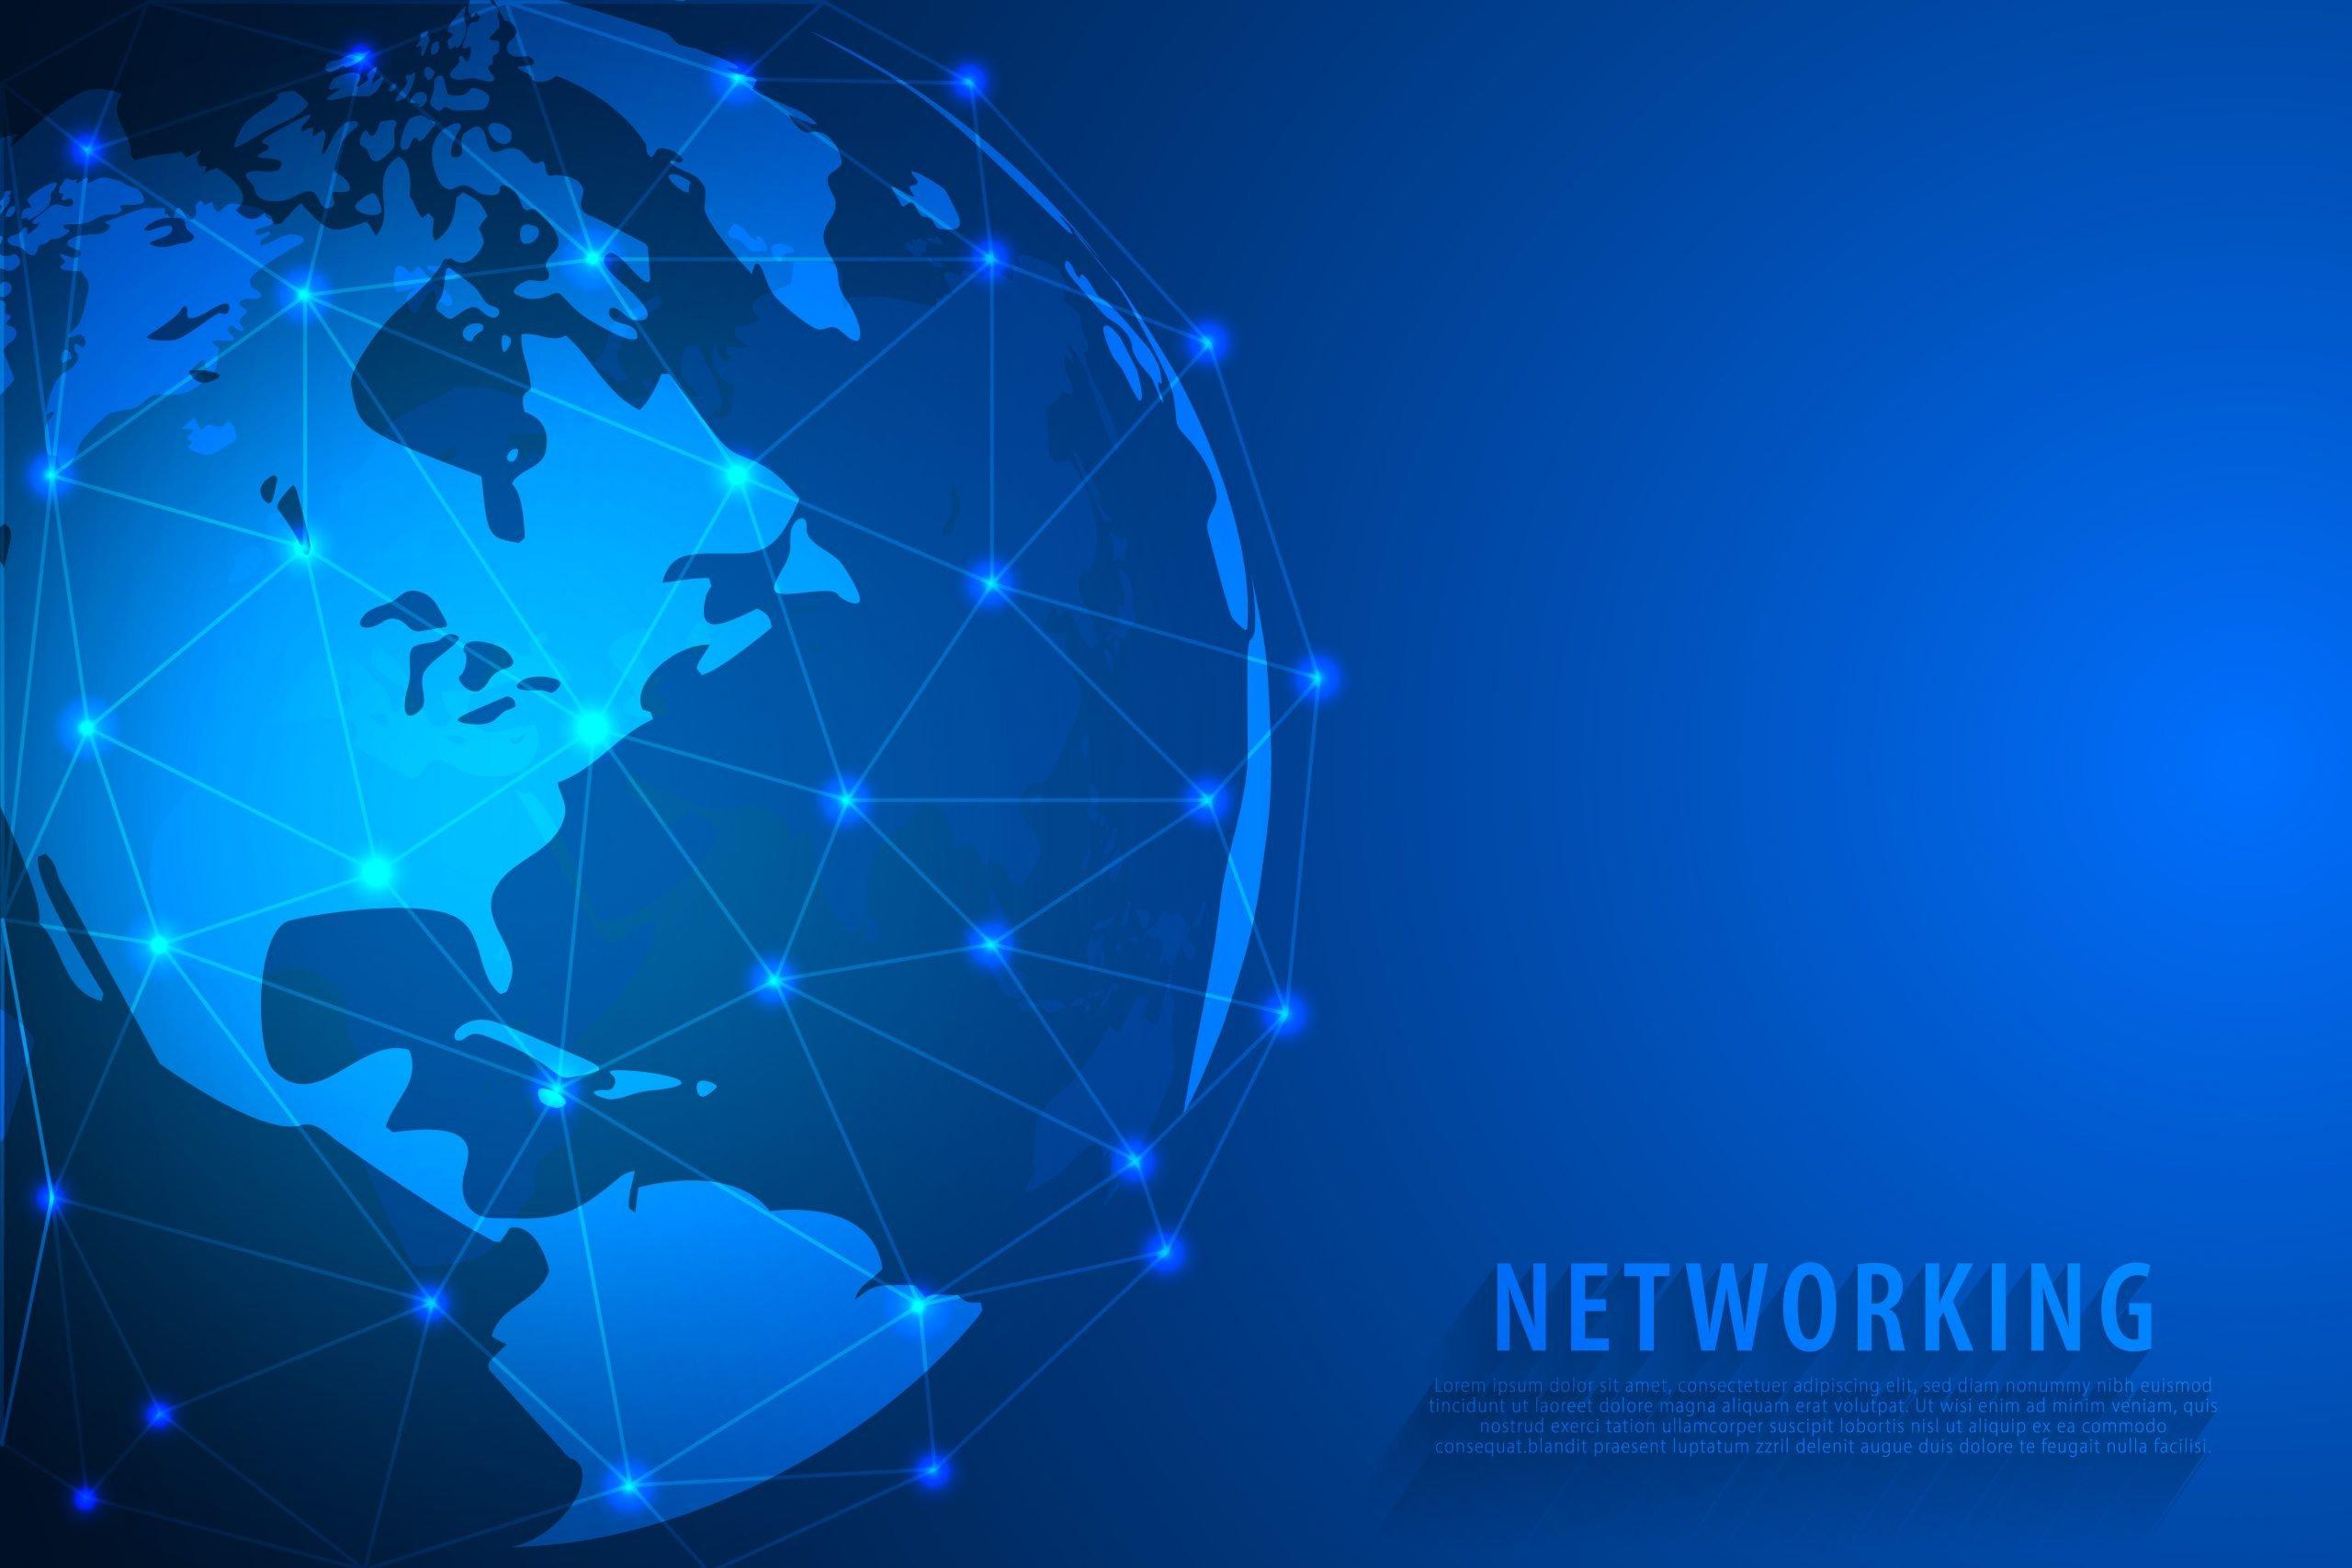 Global network connection background, blue world map, vector, illustration, eps file